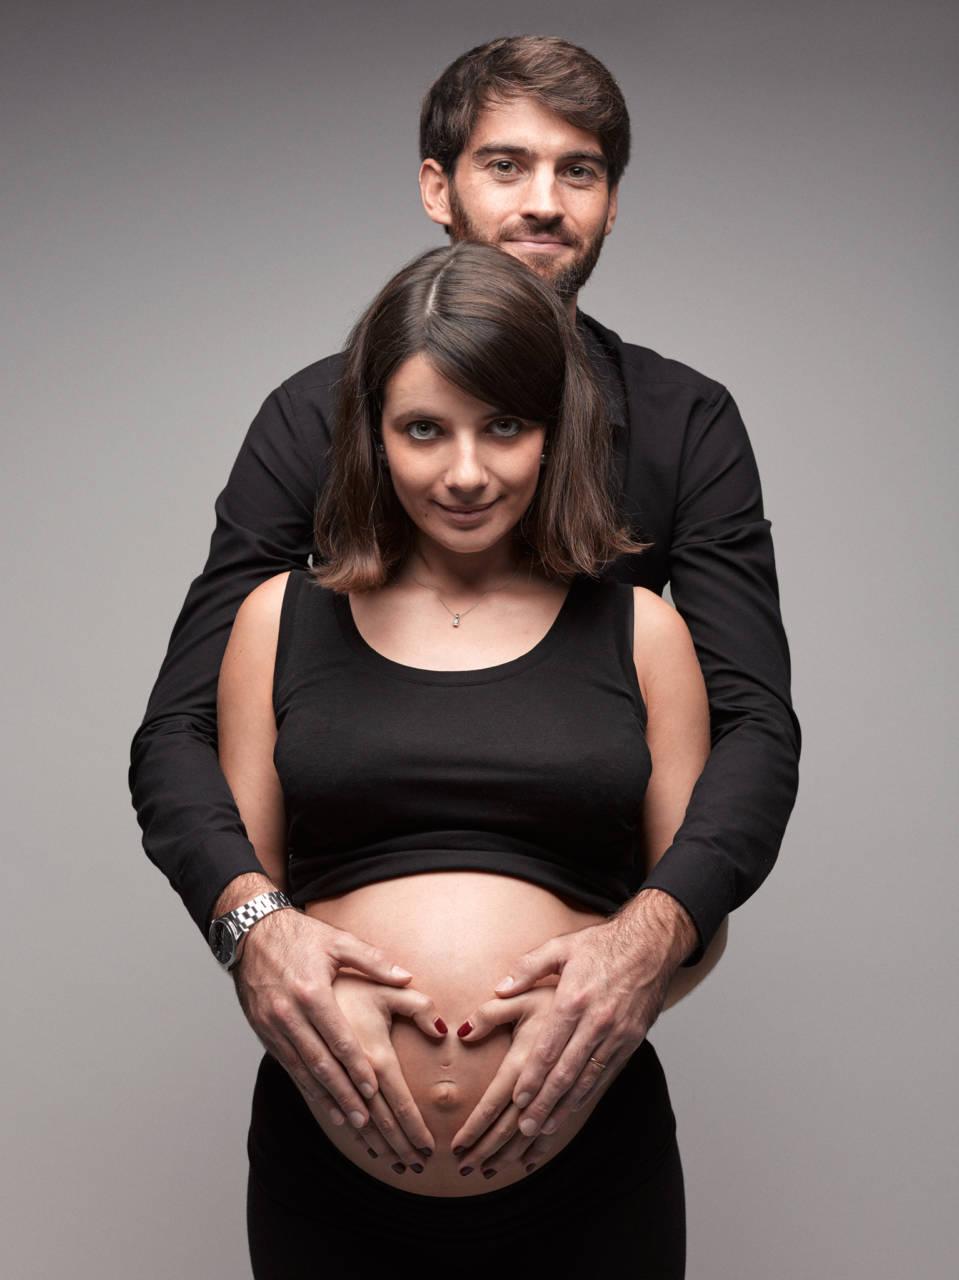 Séance grossesse / Pregnancy Shoot